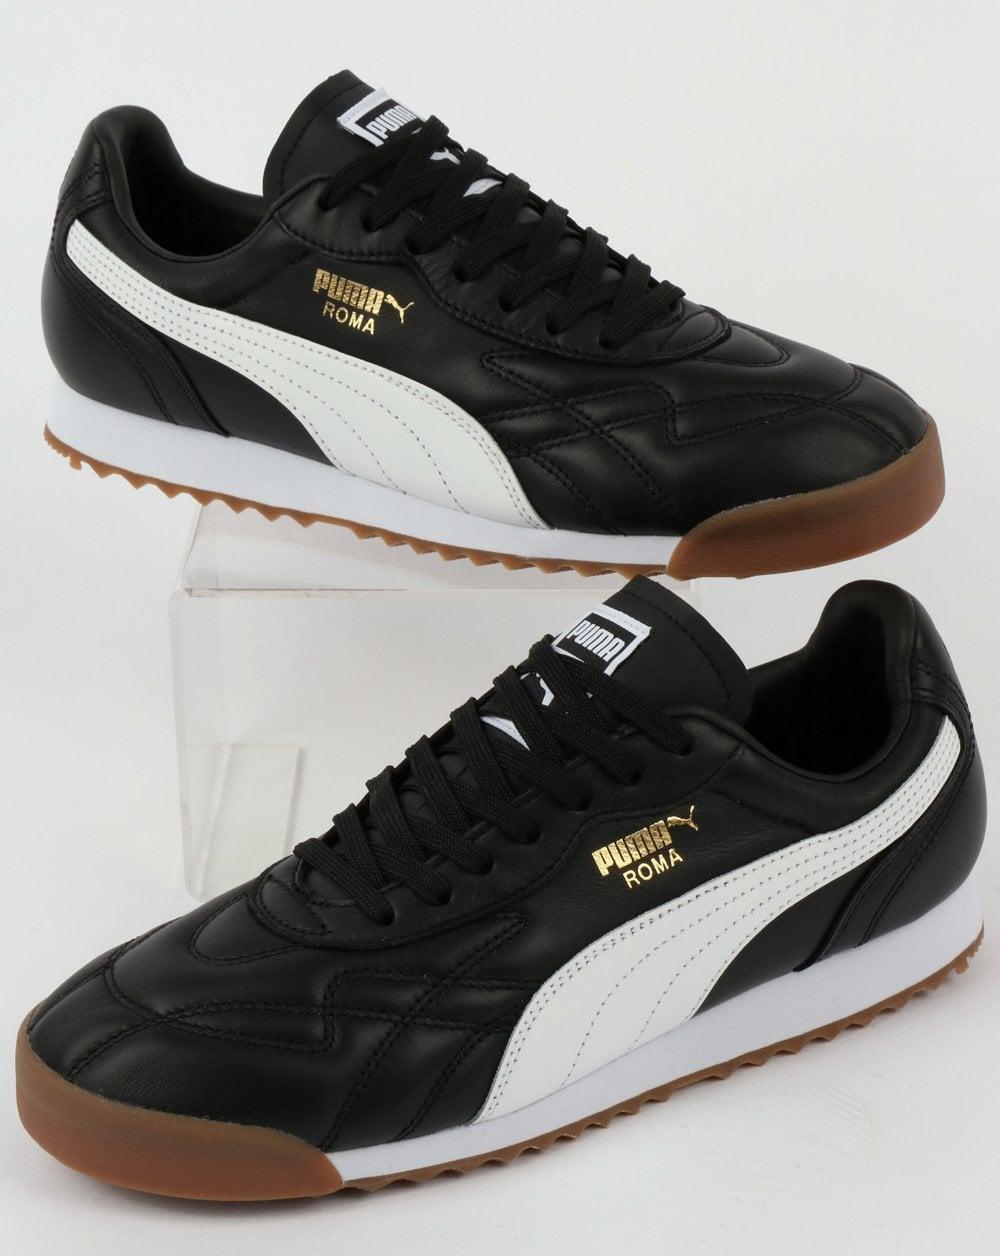 86768555 Puma Roma Anniversario Trainer Black/White